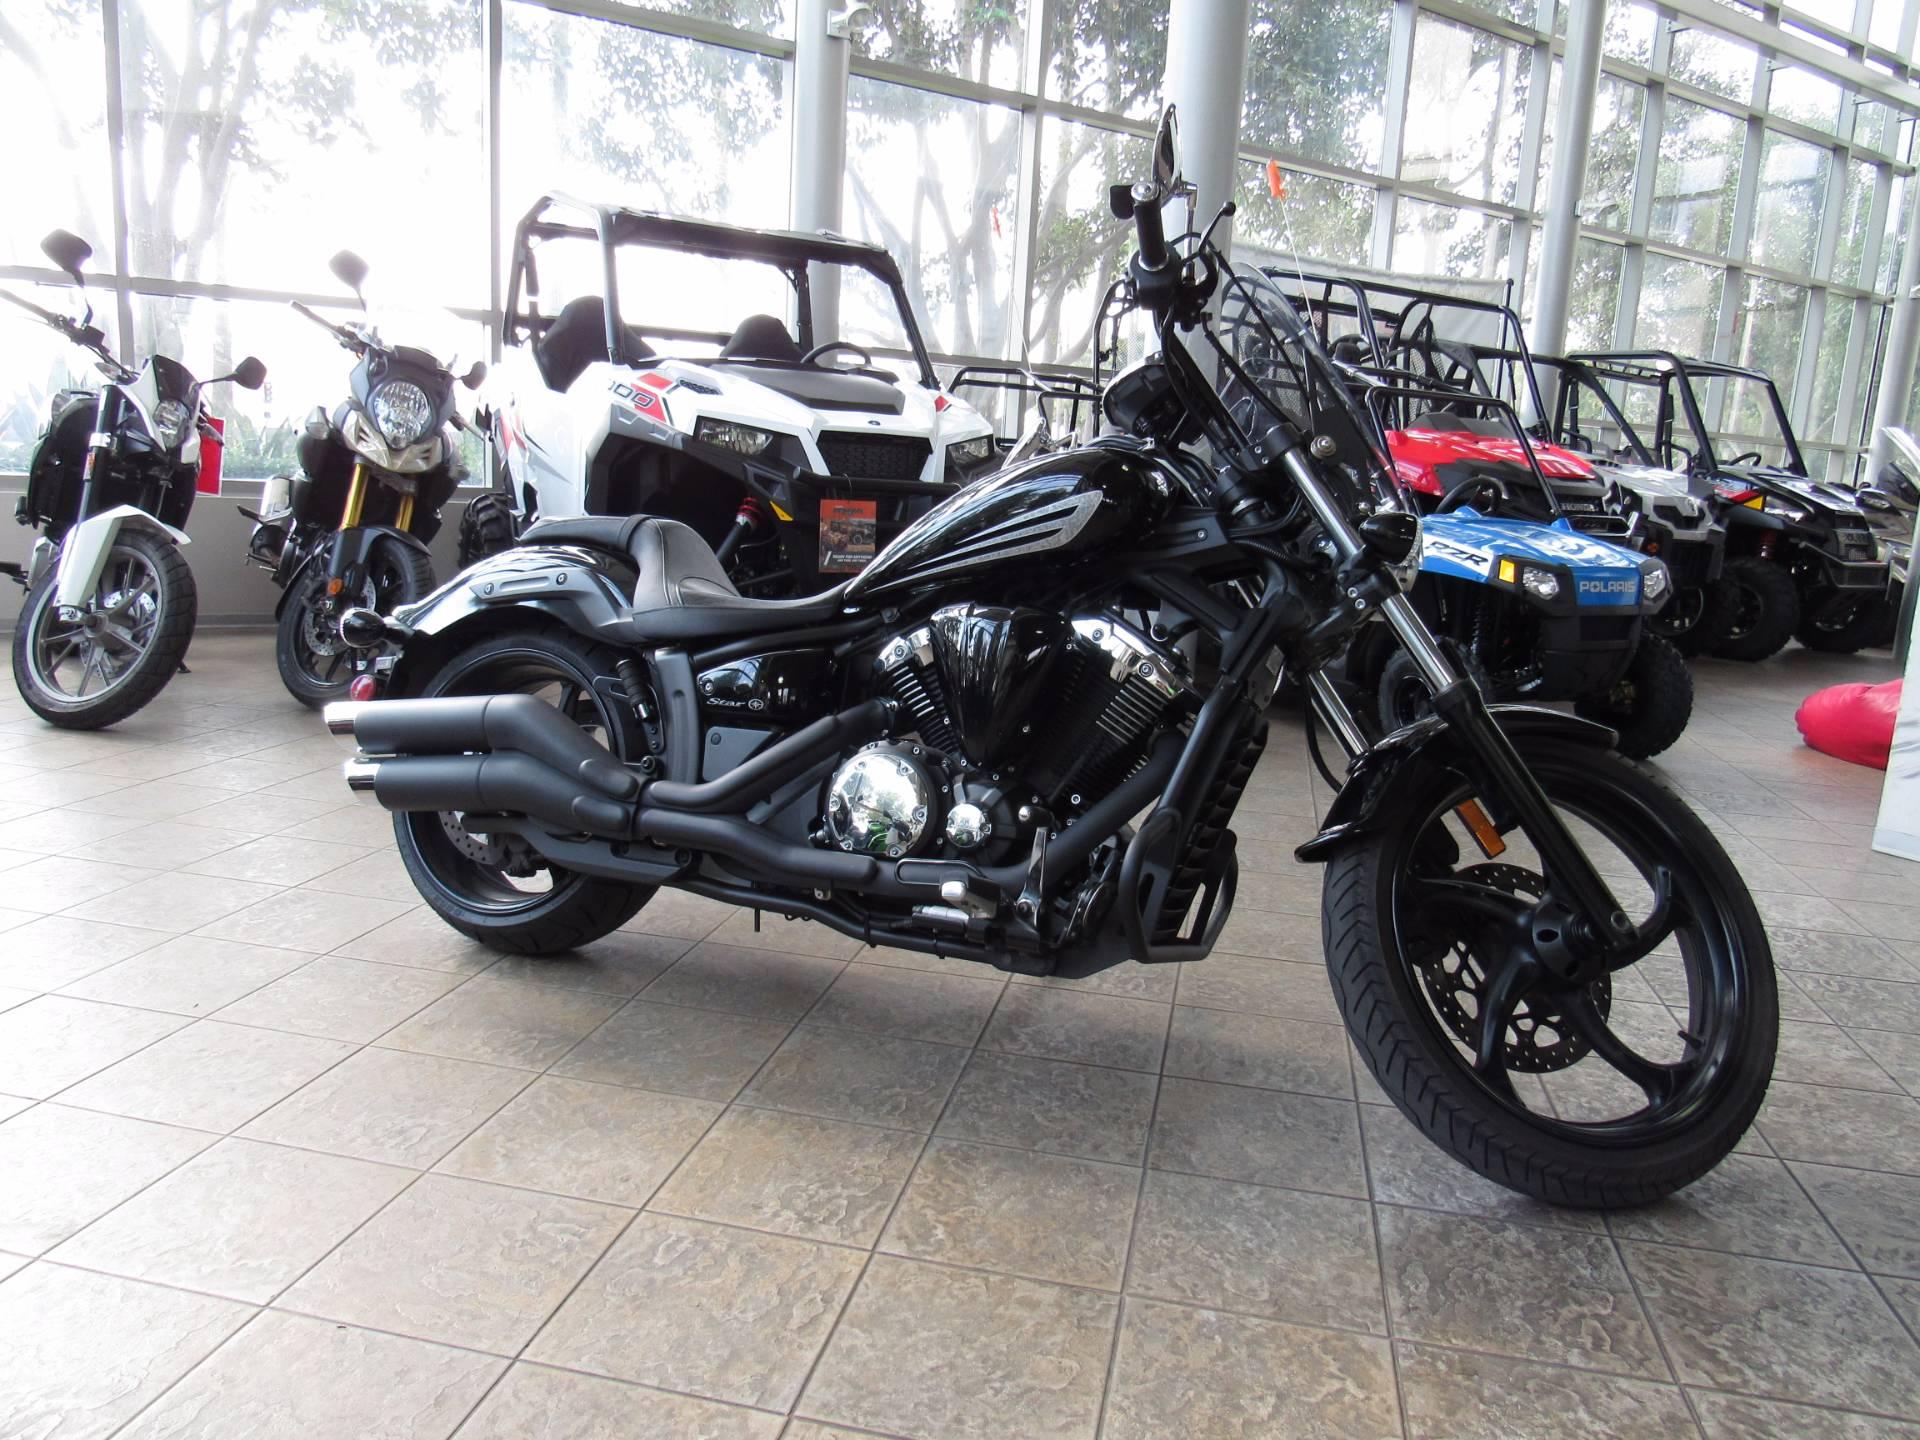 2011 Yamaha Stryker for sale 66096